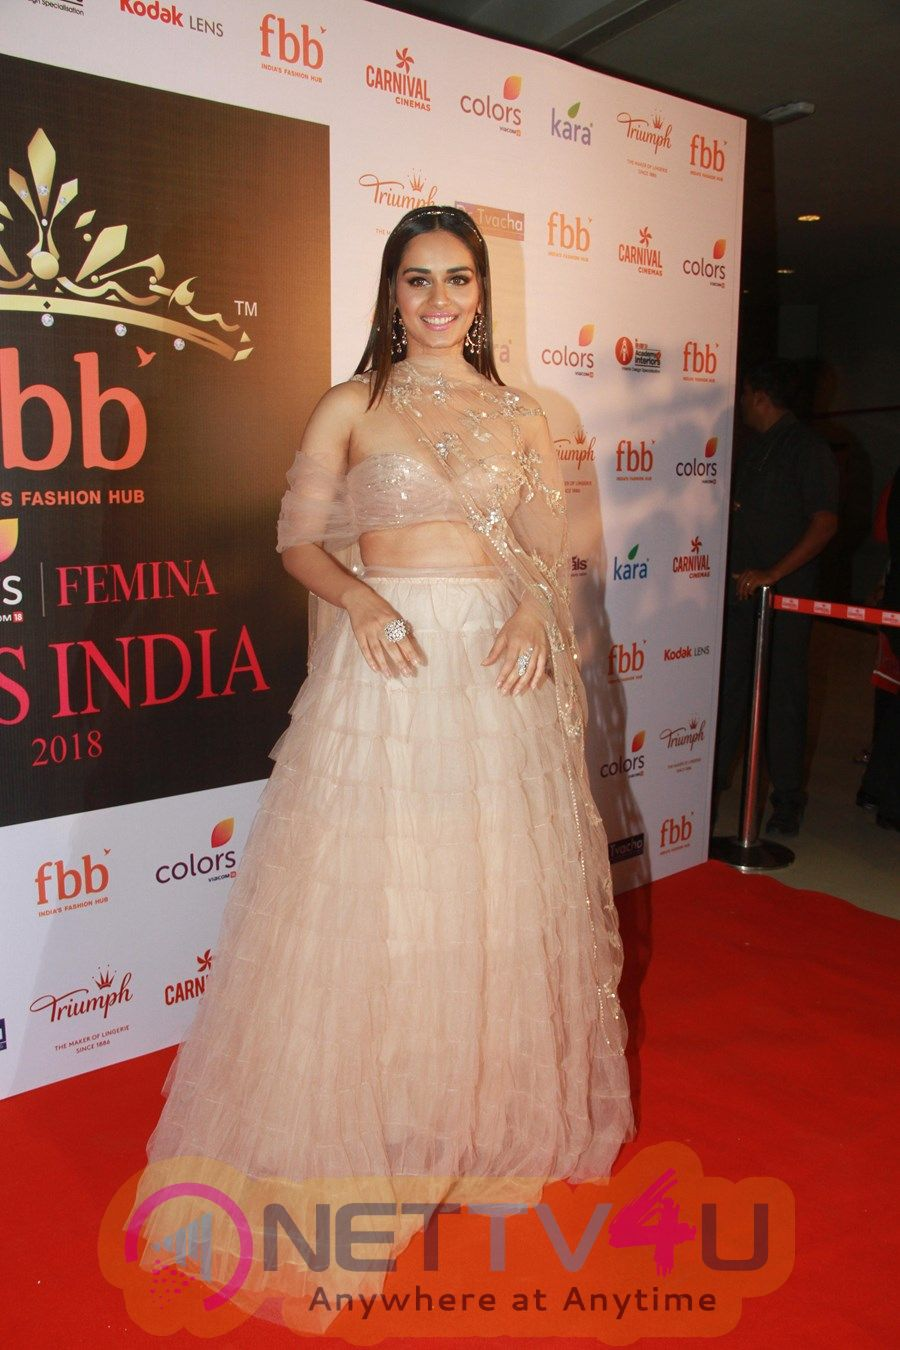 Femina Miss India Conference With Manushi Chhillar